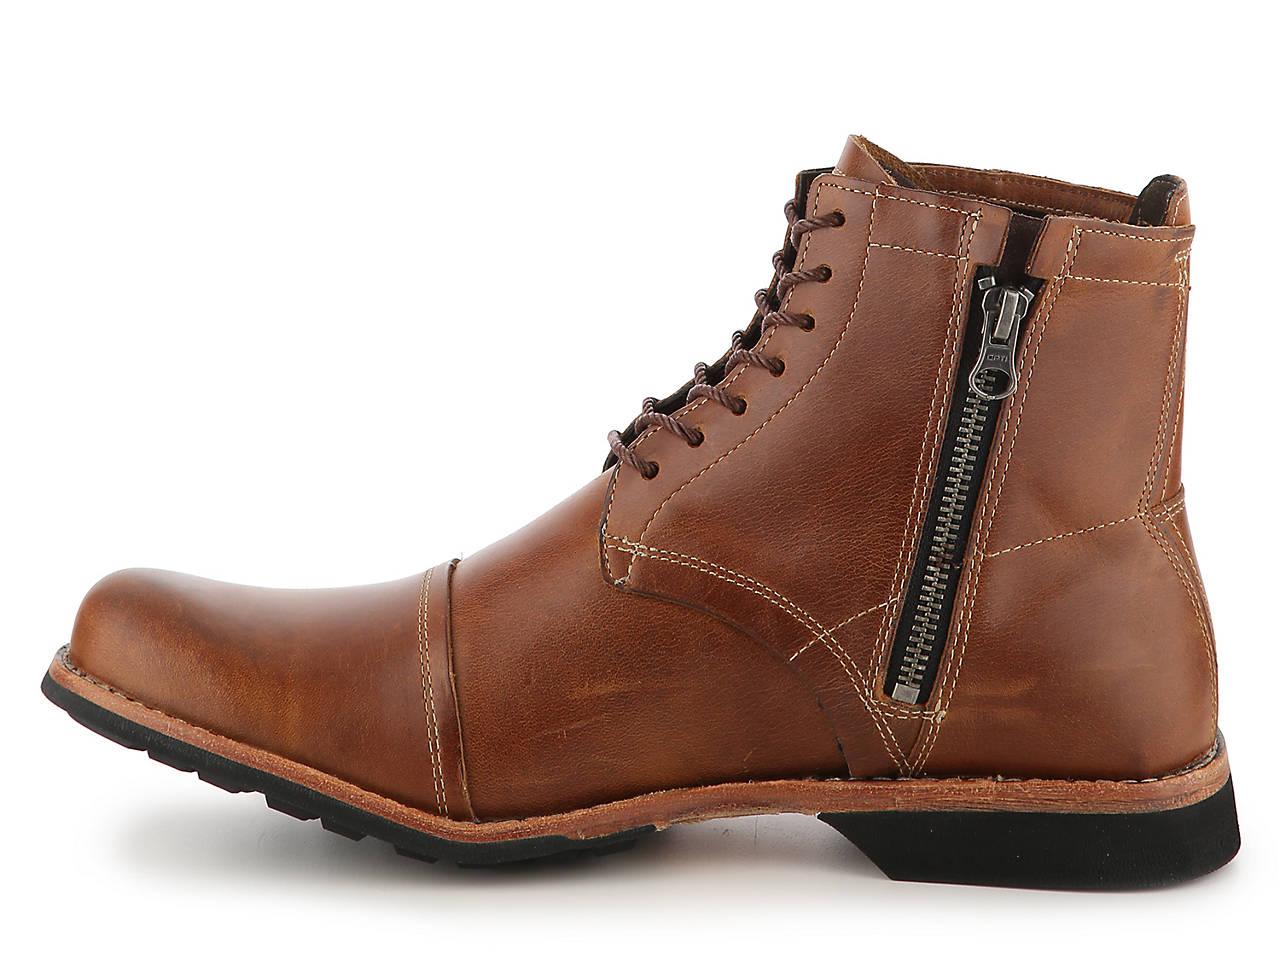 Timberland Earthkeepers 6in Zip Boot Men's Shoes DSW  DSW